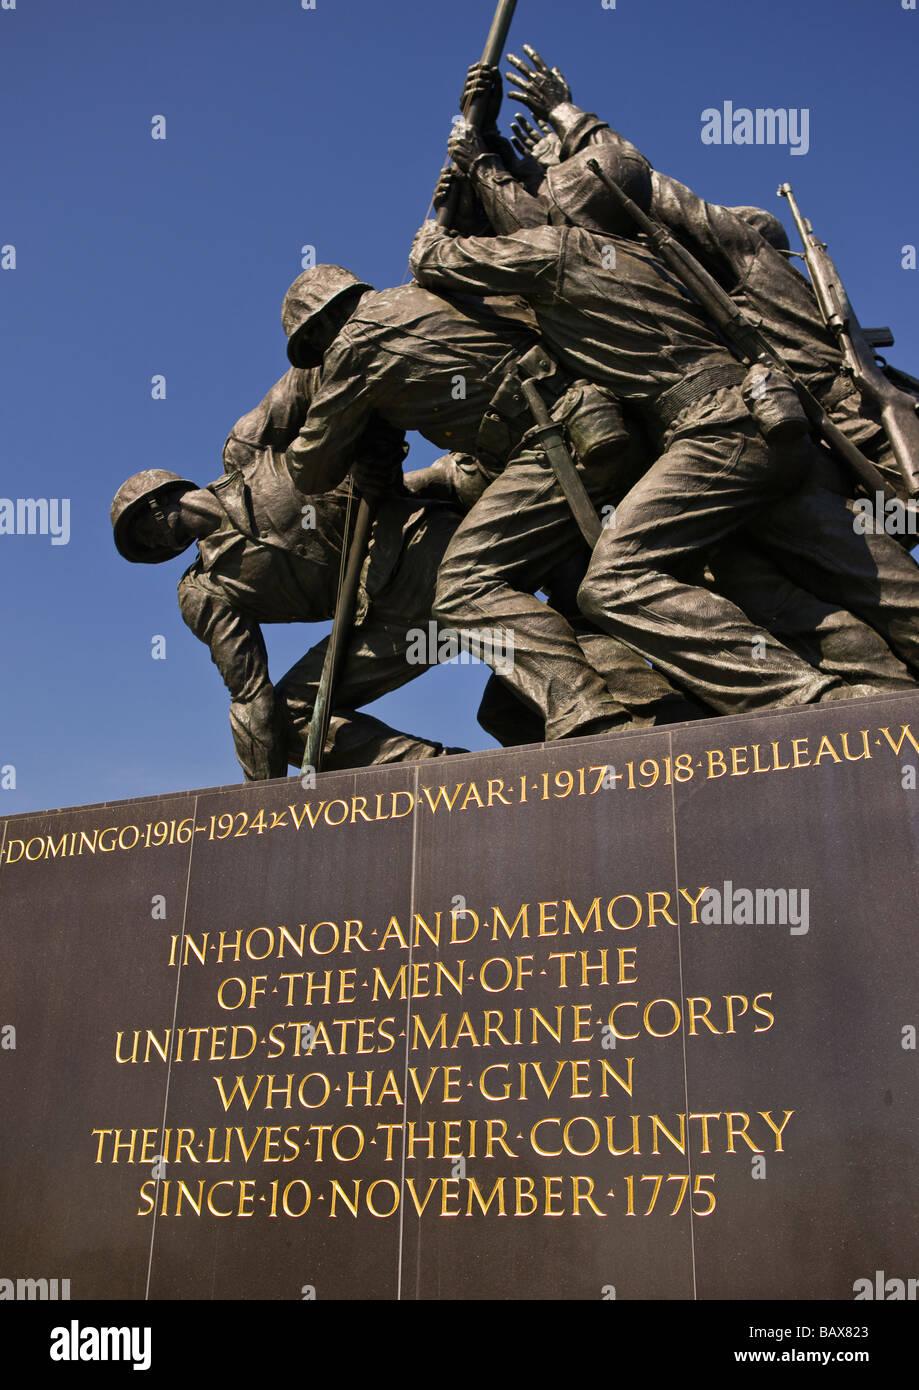 arlington virginia usa united states marine corps war